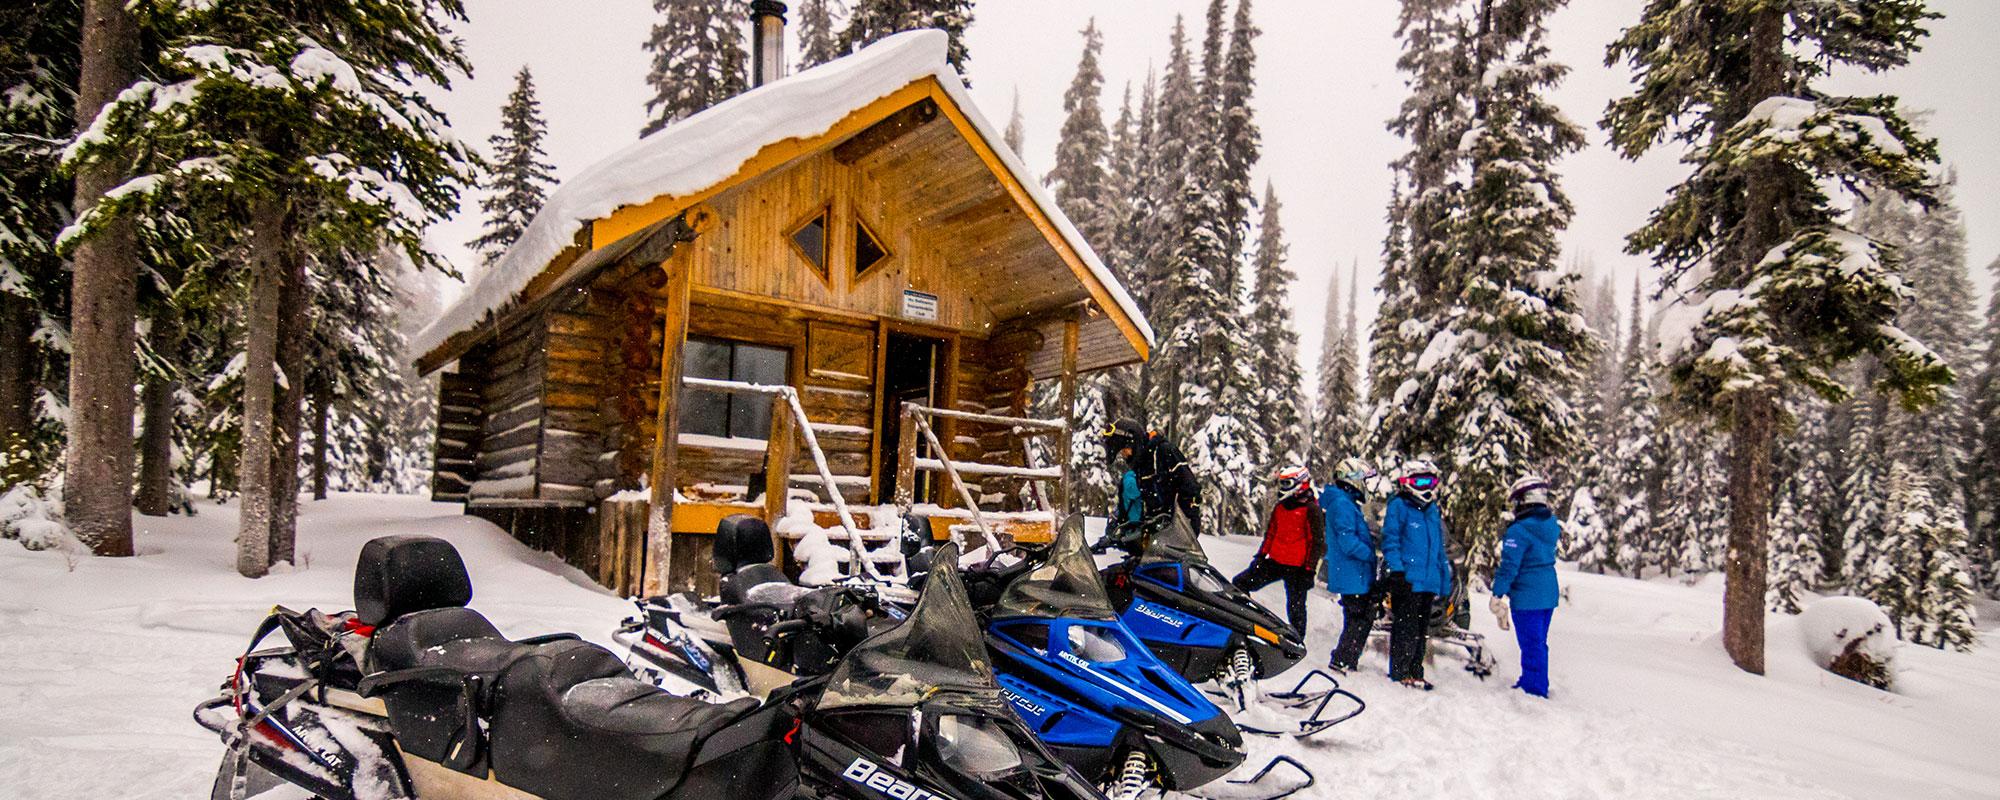 7.SNOWMOBILING -